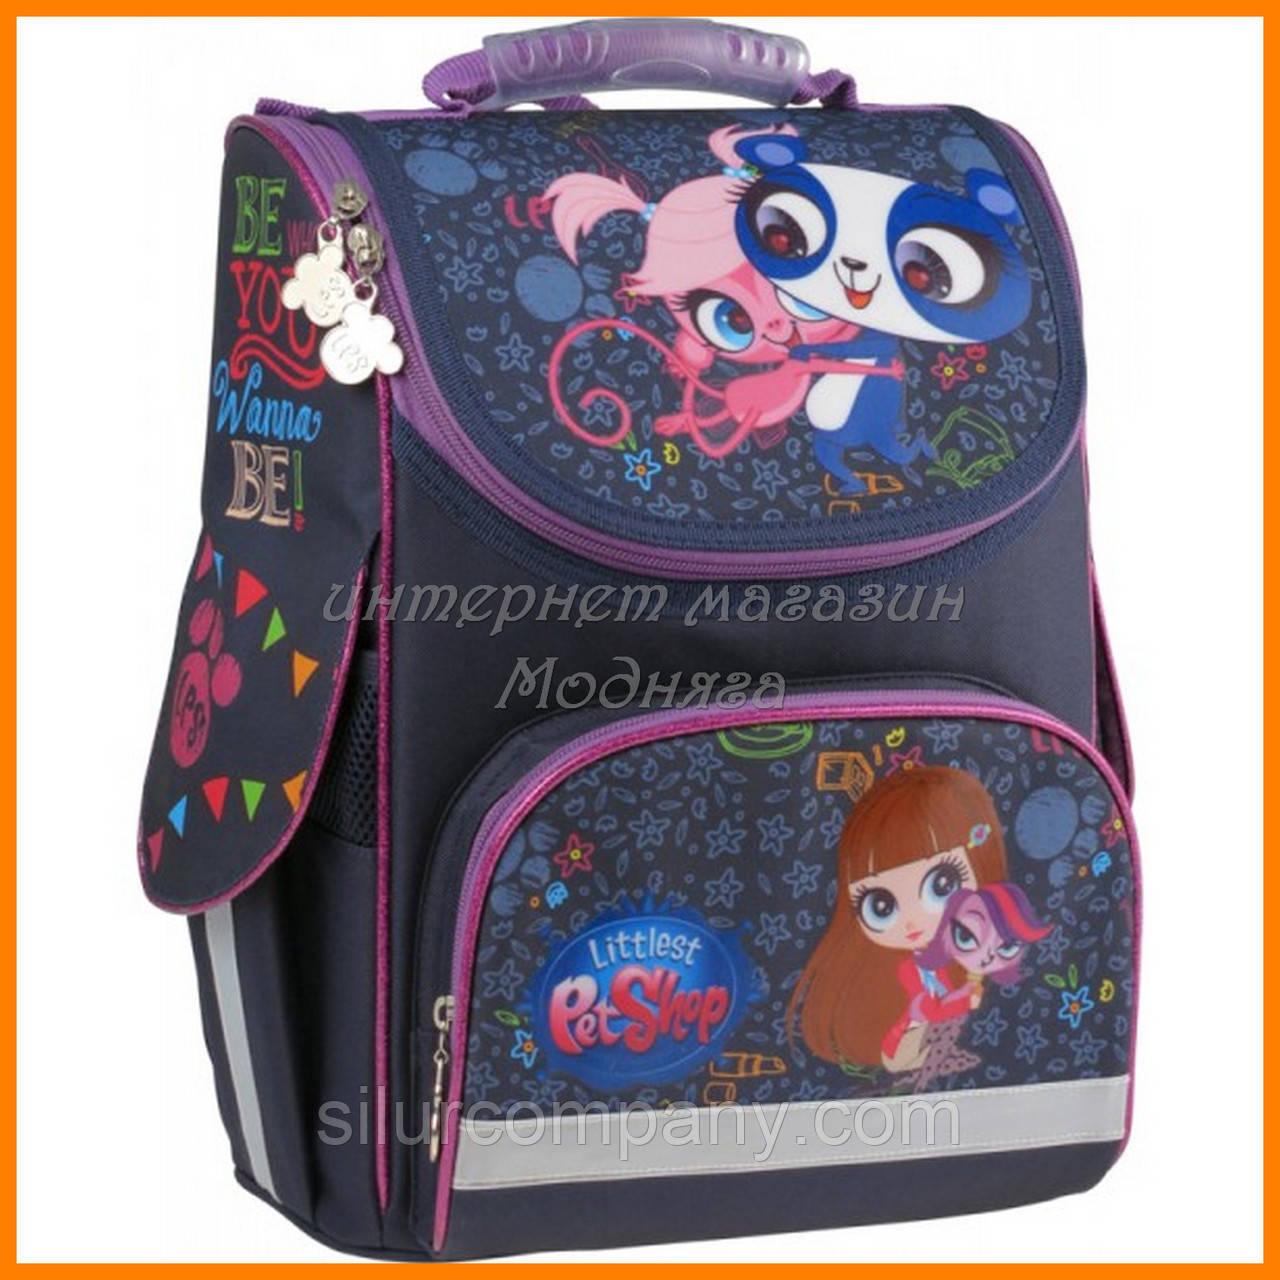 7c1b18052c73 Детские портфели Пет Шоп | Рюкзак KITE Pet Shop 501-2: продажа, цена ...